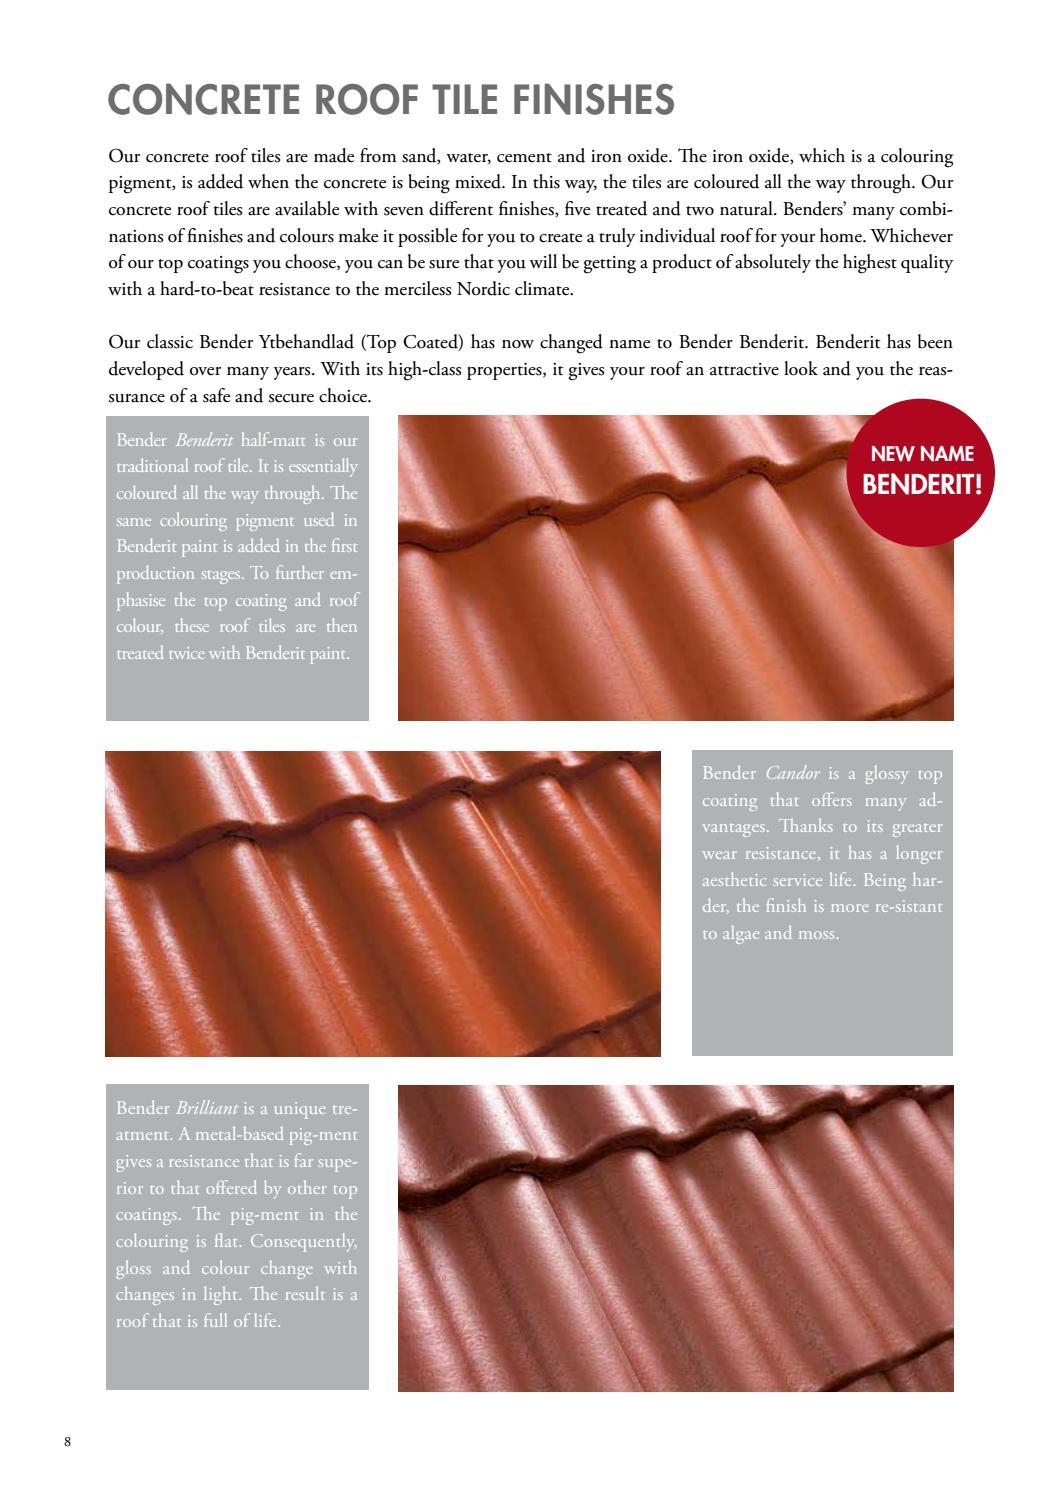 Gb Roof Mainbrochure Concrete And Interlocking By Benders Sverige Ab Issuu